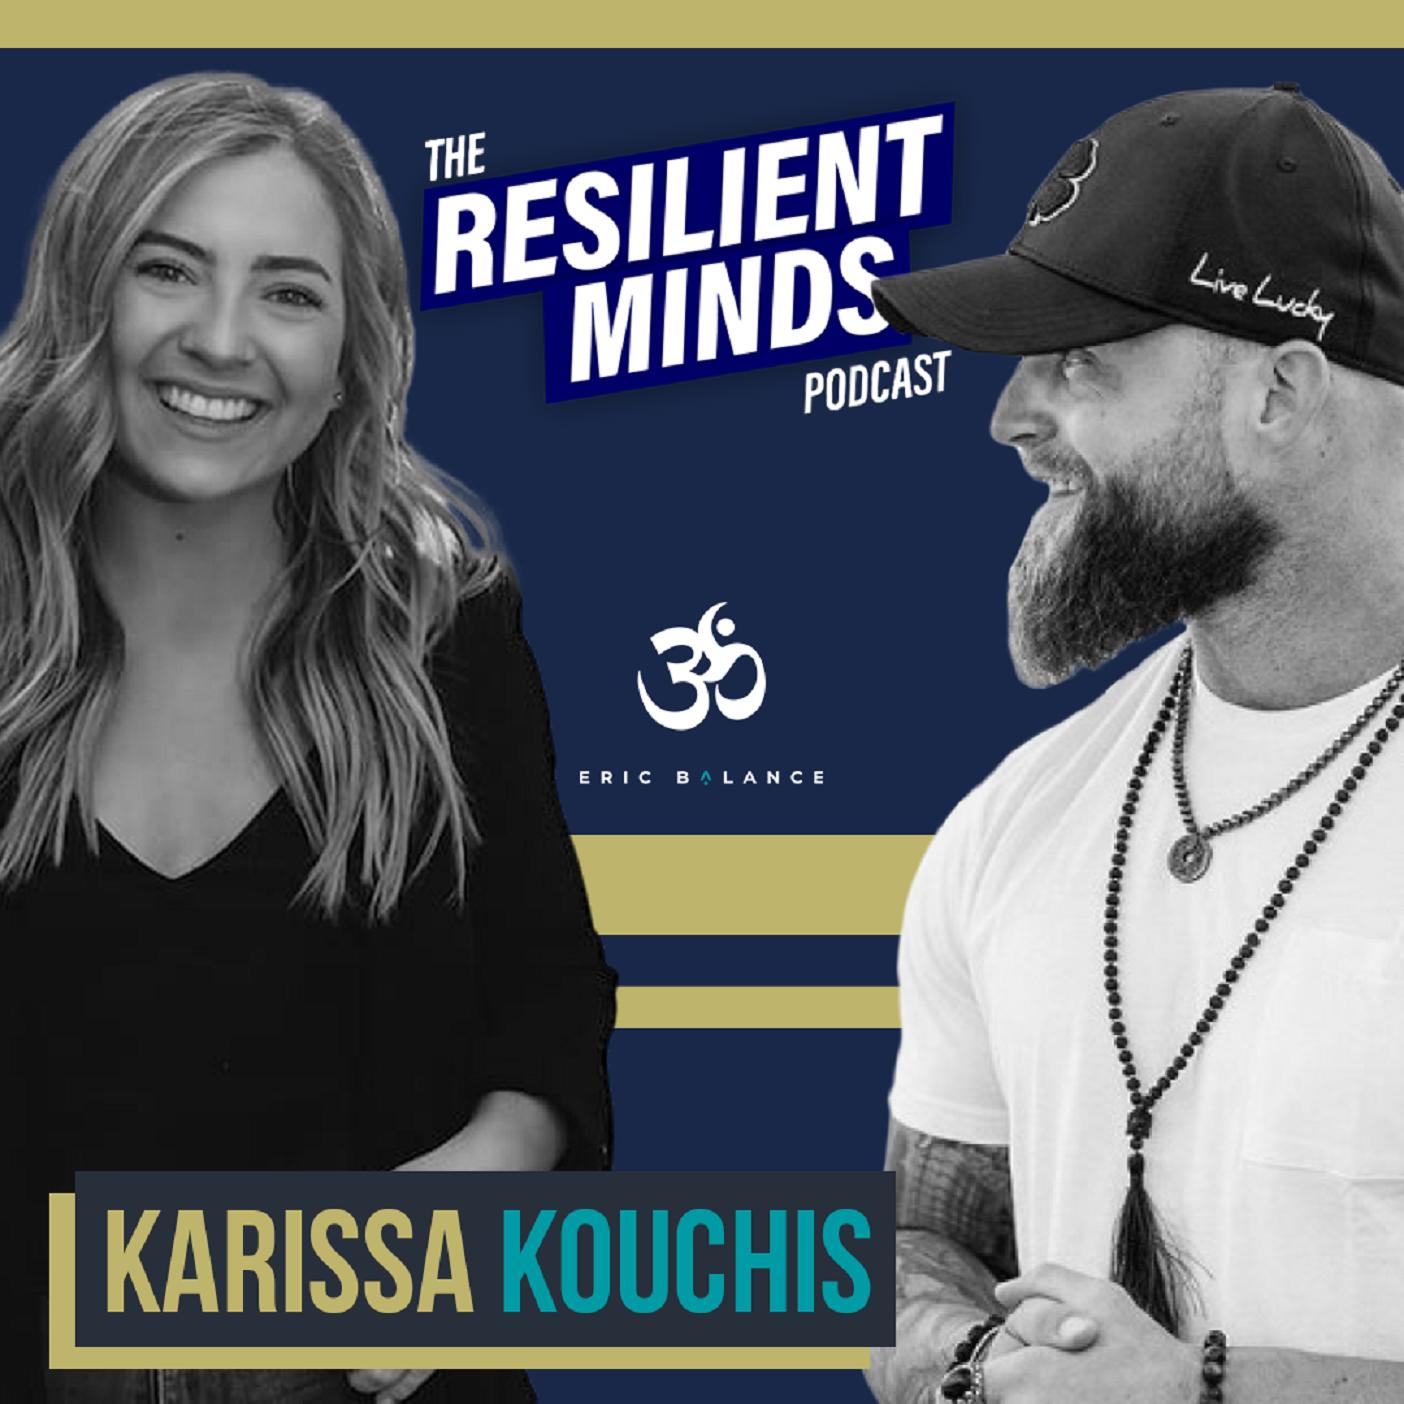 Episode 74 – How To Achieve Your Life Purpose Through Spiritual Rebirths With Karissa Kouchis